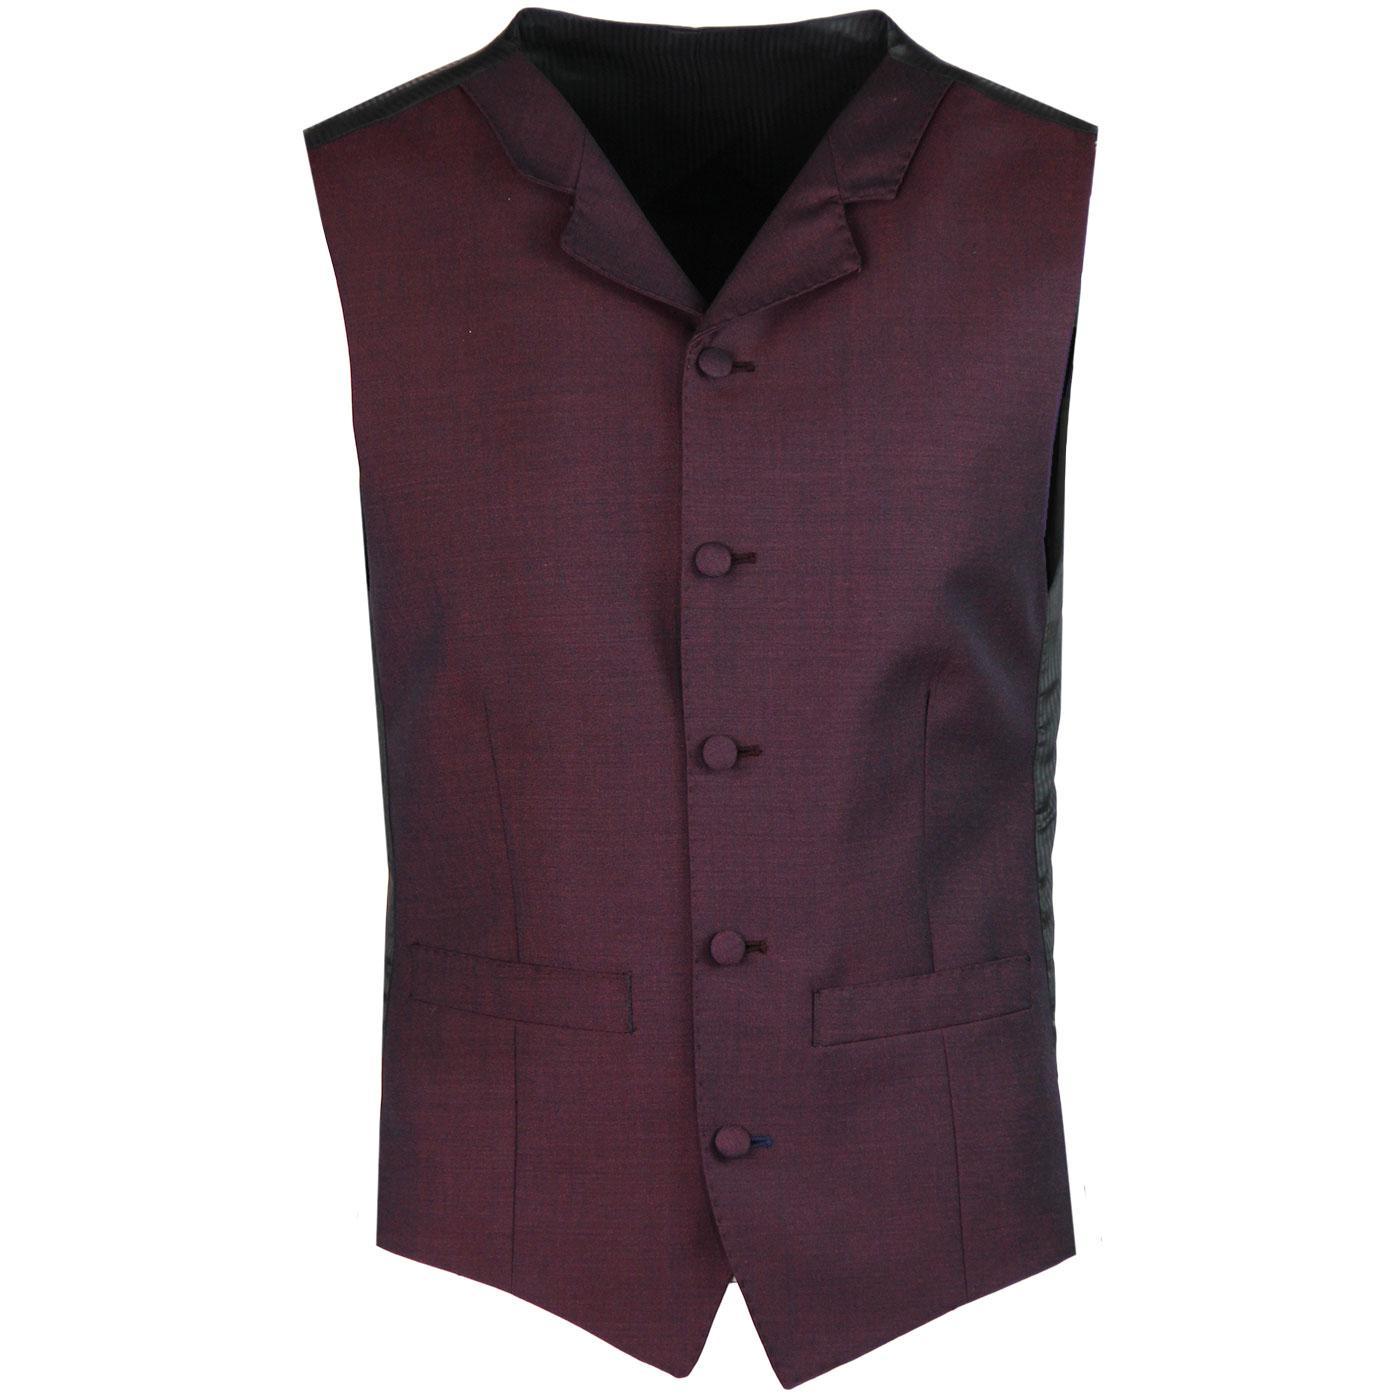 MADCAP ENGLAND Mod Mohair Tonic Waistcoat BURGUNDY